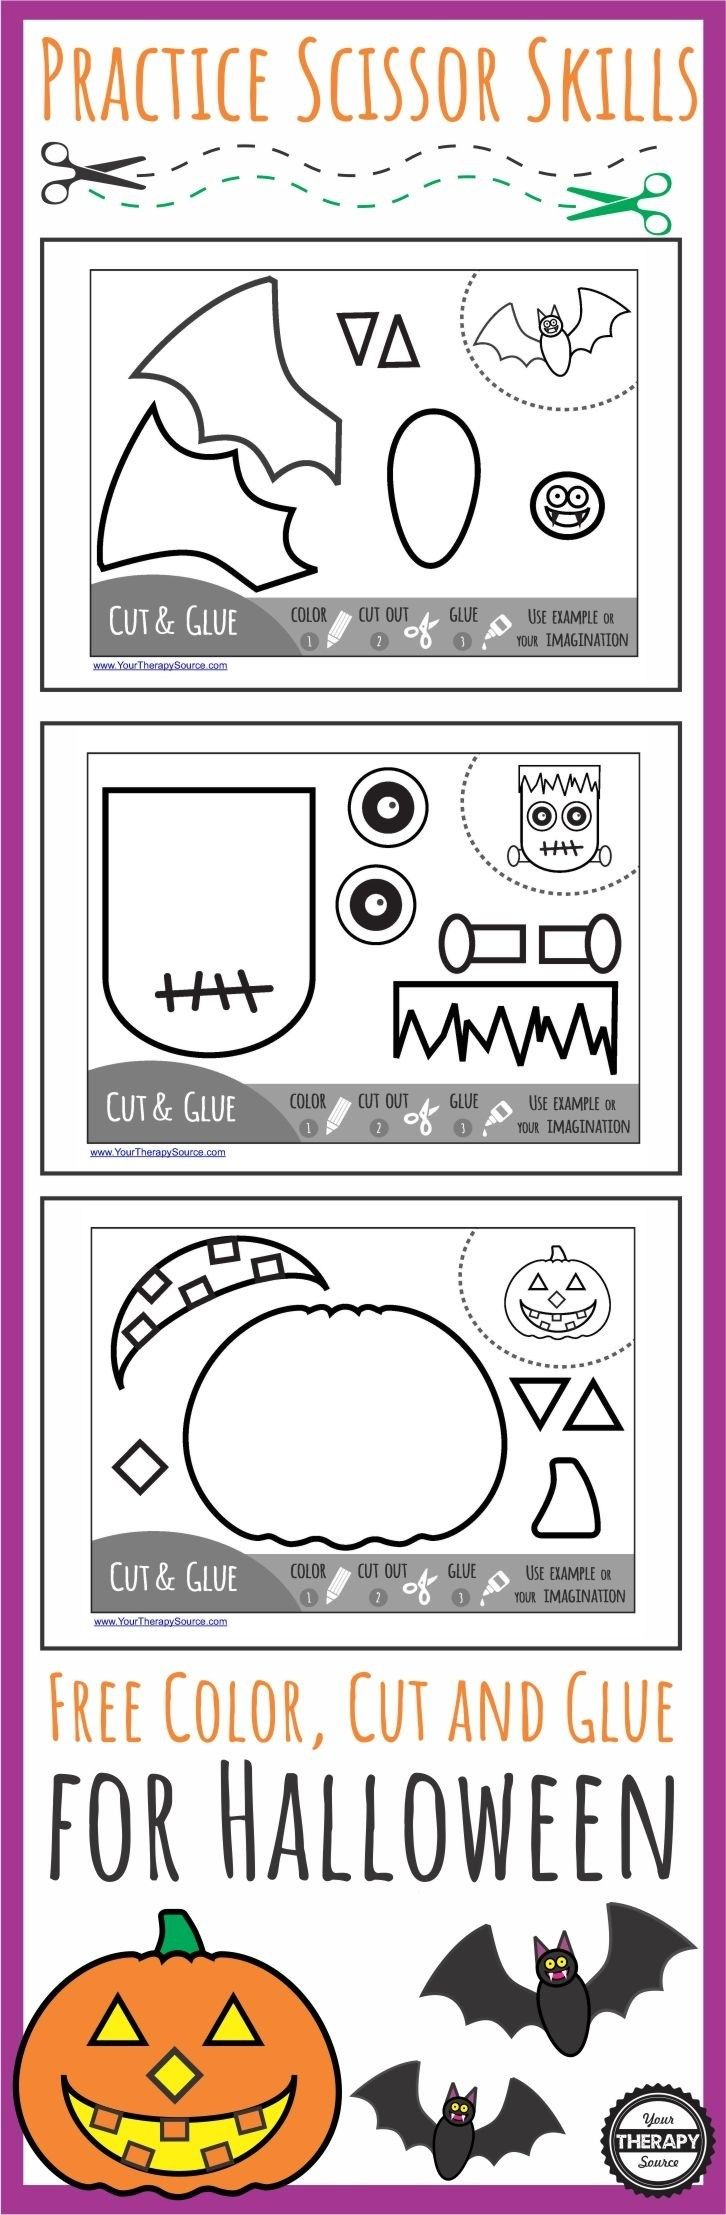 October Pinterest Roundup: All Things Halloween | Amy Senter